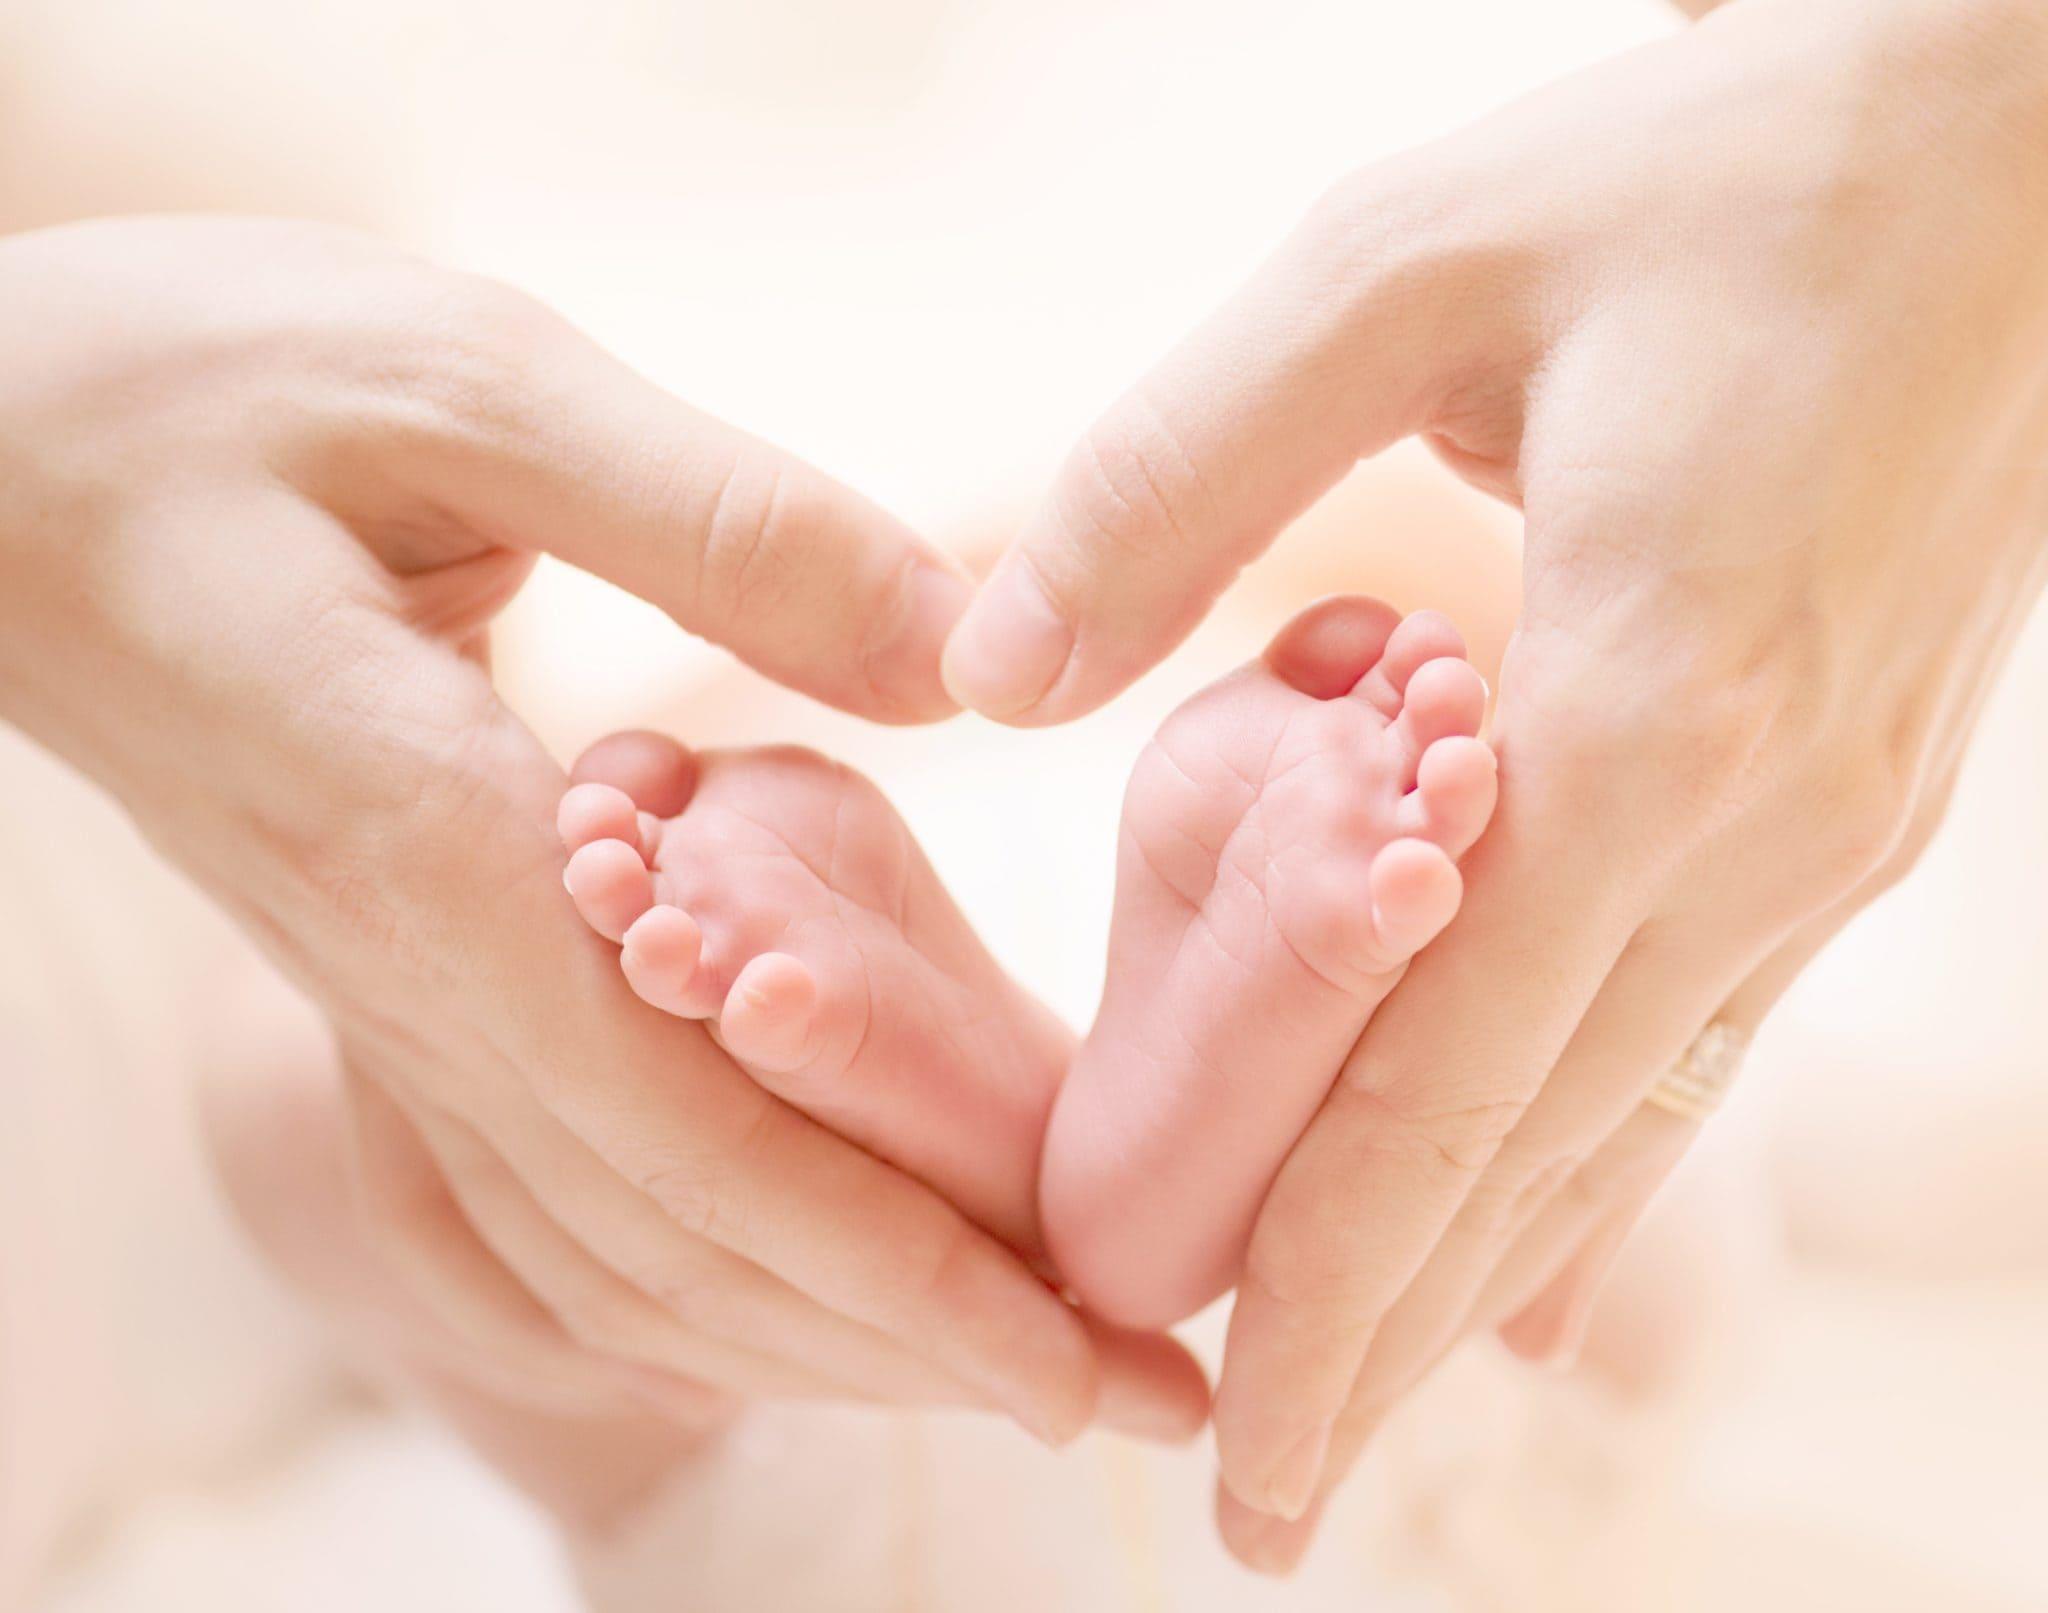 کیفیت اسپرم و سقط جنین